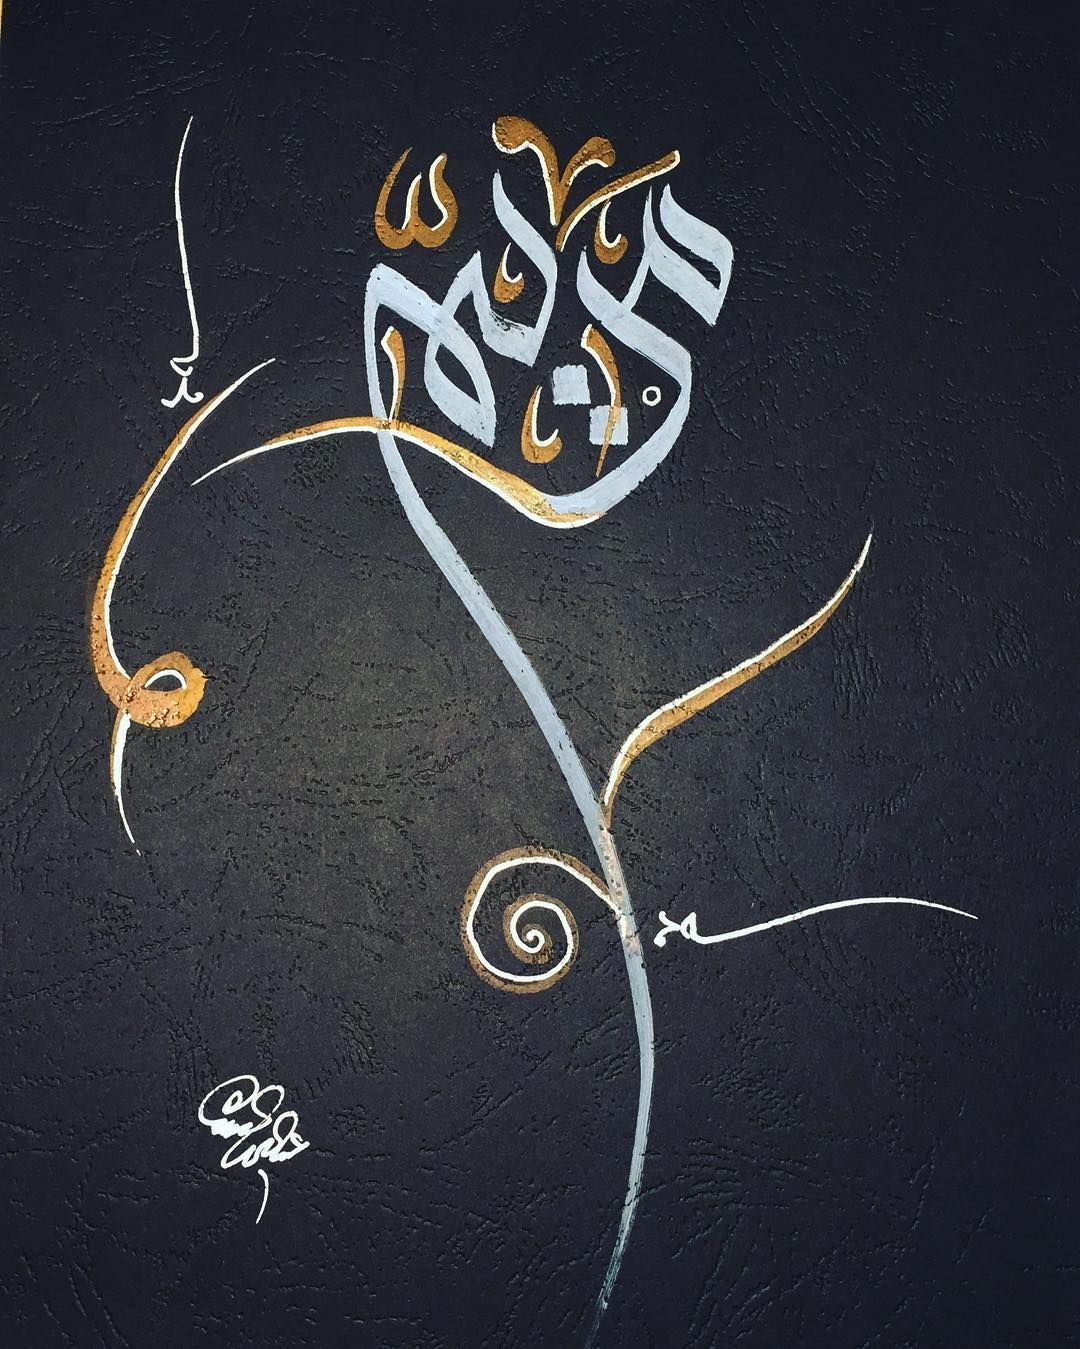 Pin By Marian Mahmoud On Aisha Badi Islamic Calligraphy Painting Arabic Calligraphy Tattoo Arabic Calligraphy Design